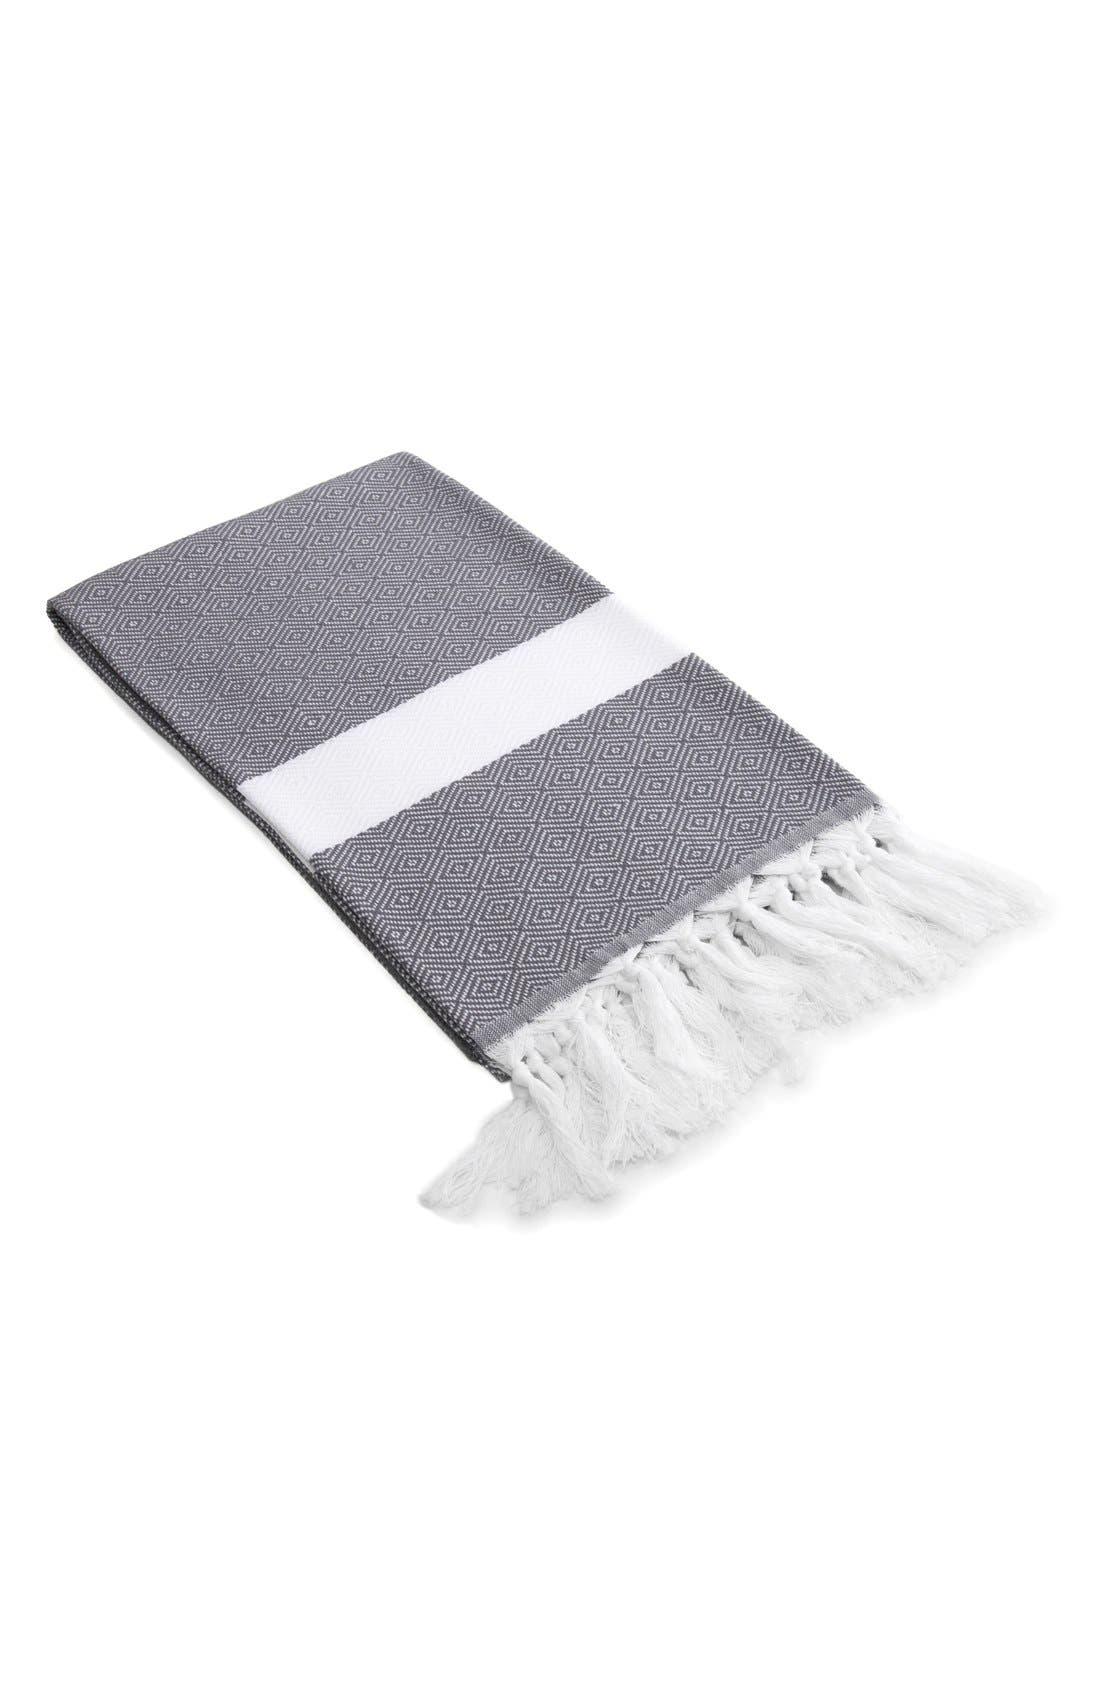 'Diamond' Turkish Pestemal Towel,                             Main thumbnail 1, color,                             GREY